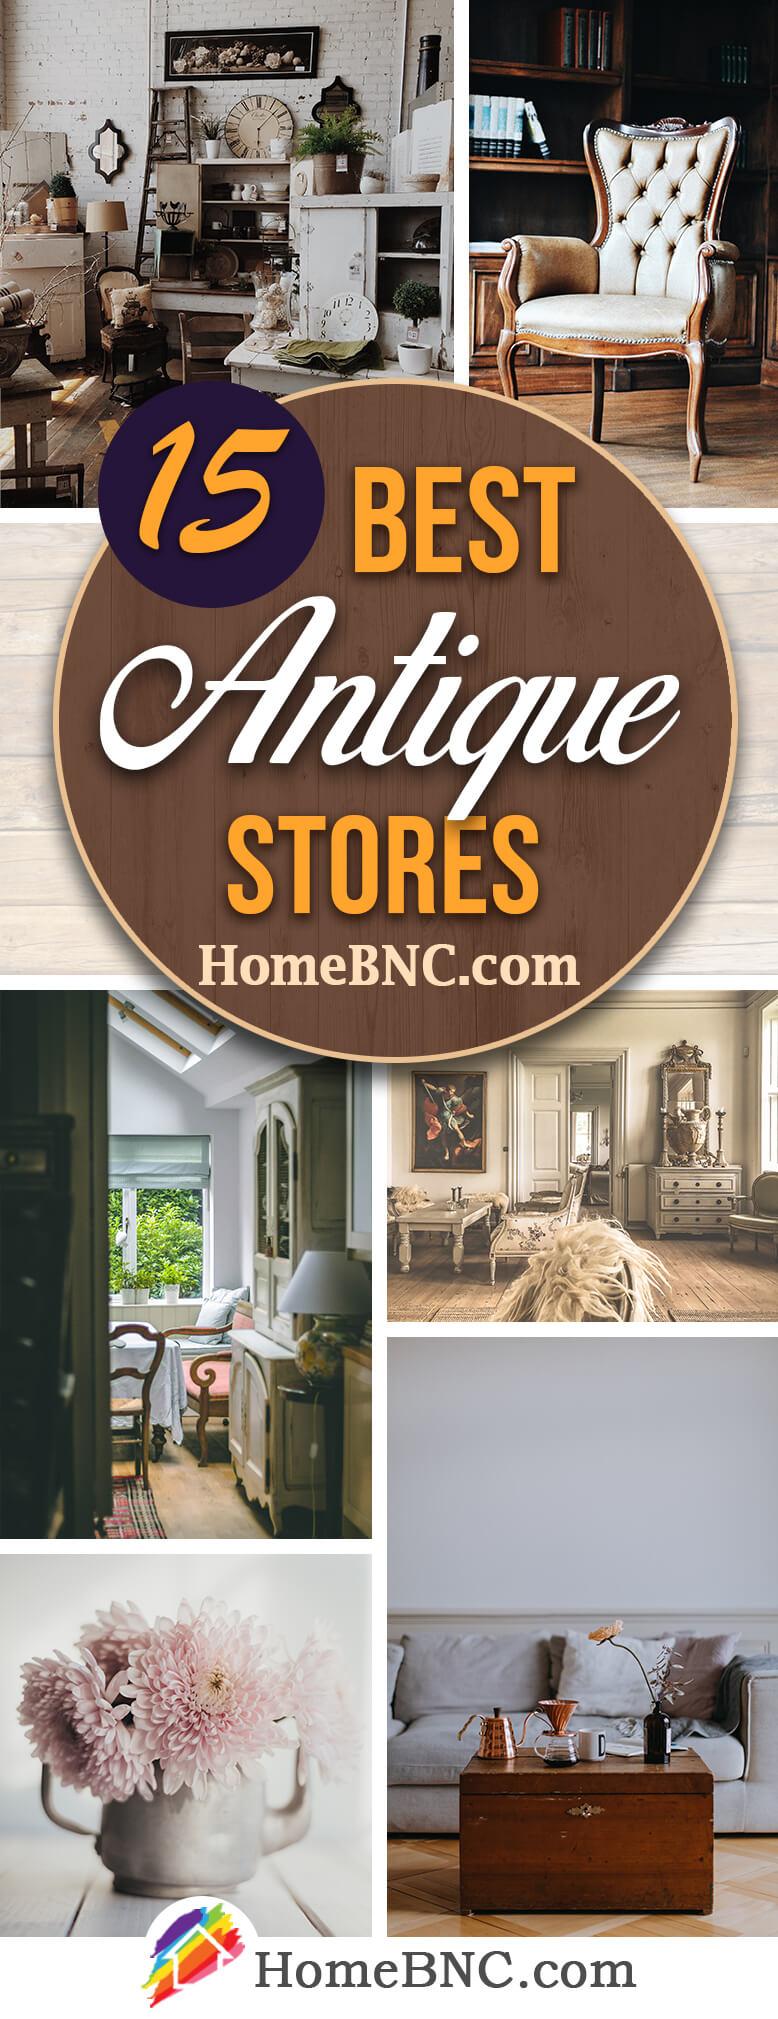 Best Antique Stores